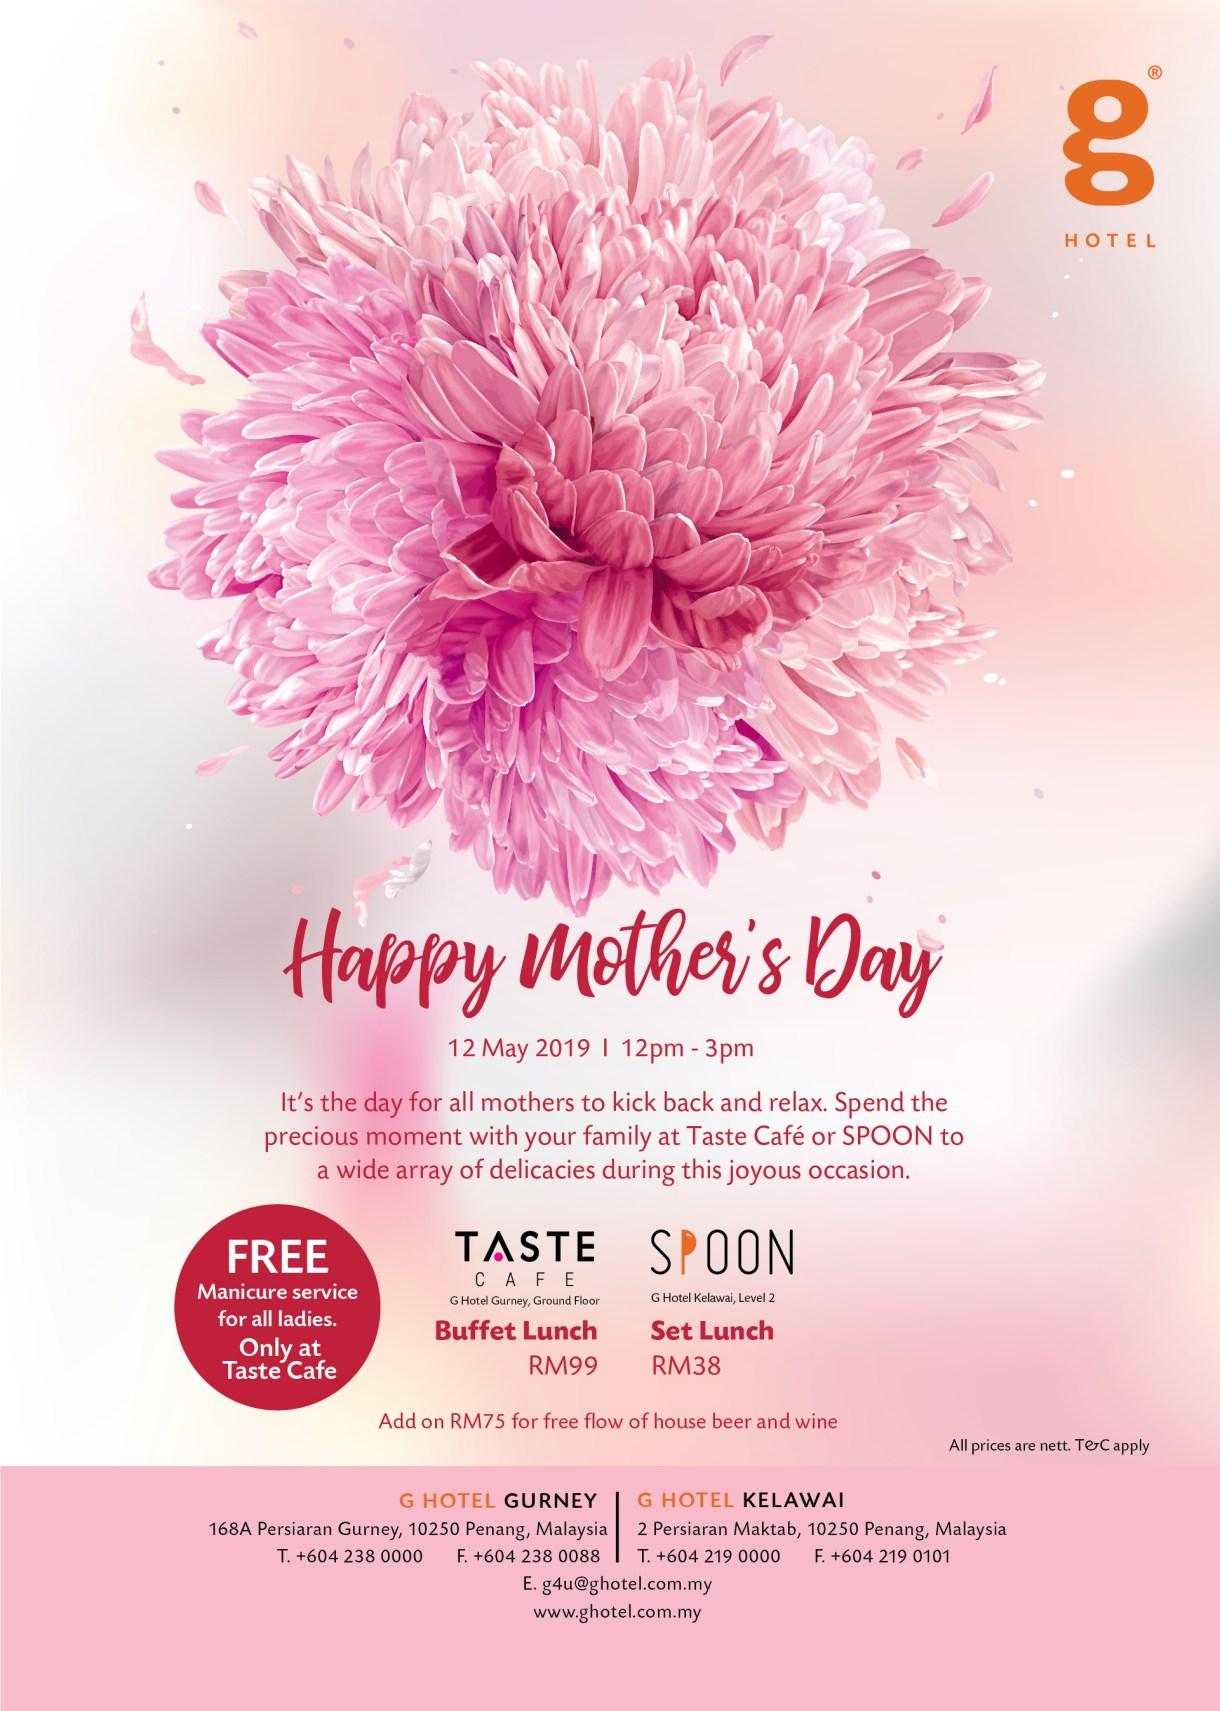 mother's day celebration ideas 2019